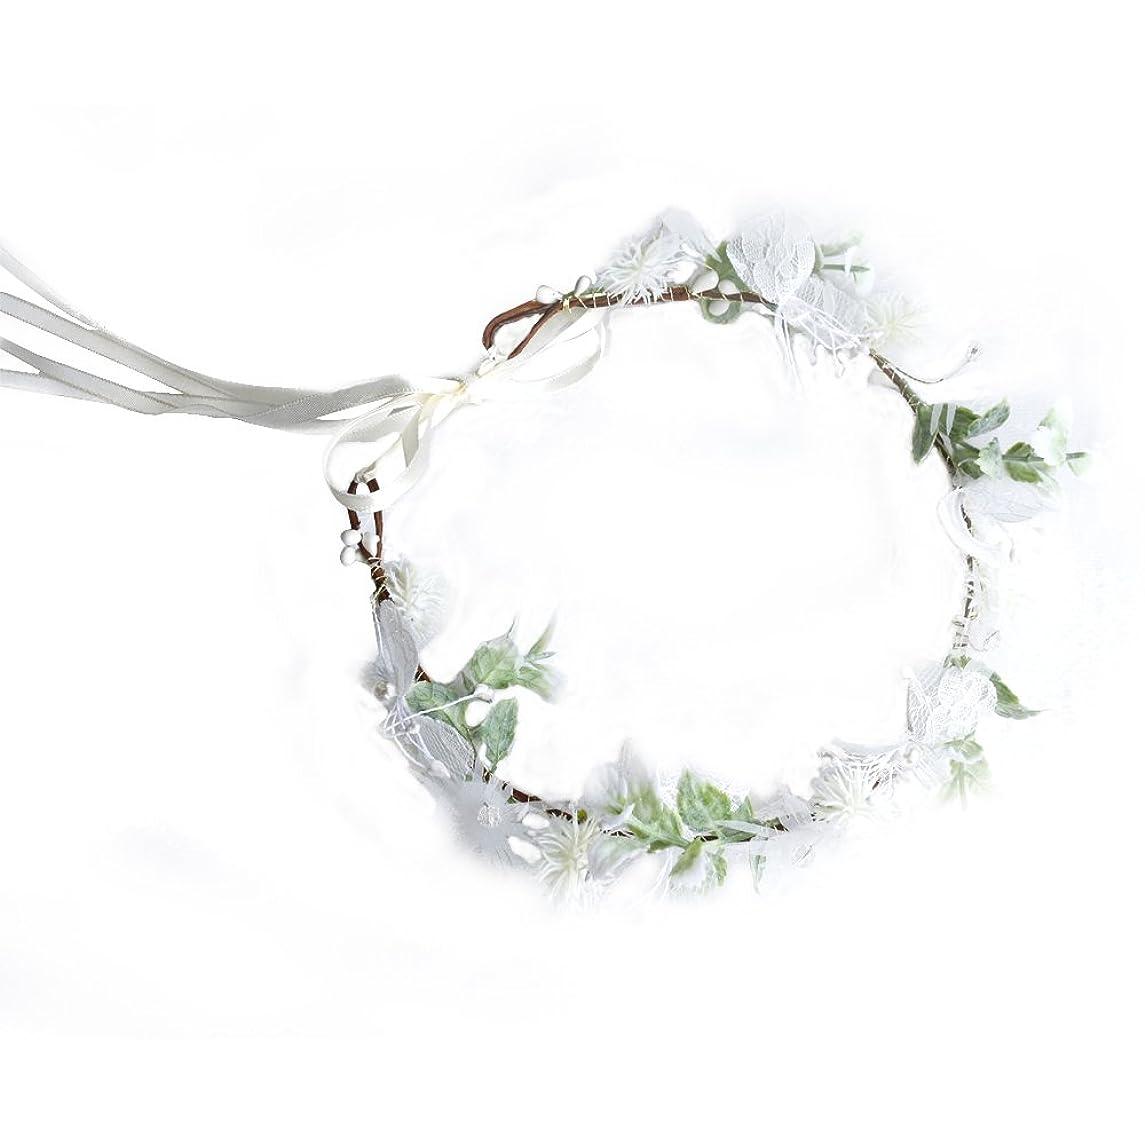 Miguor lace White Flowers Bridal Wreath Headband for Wedding Decor